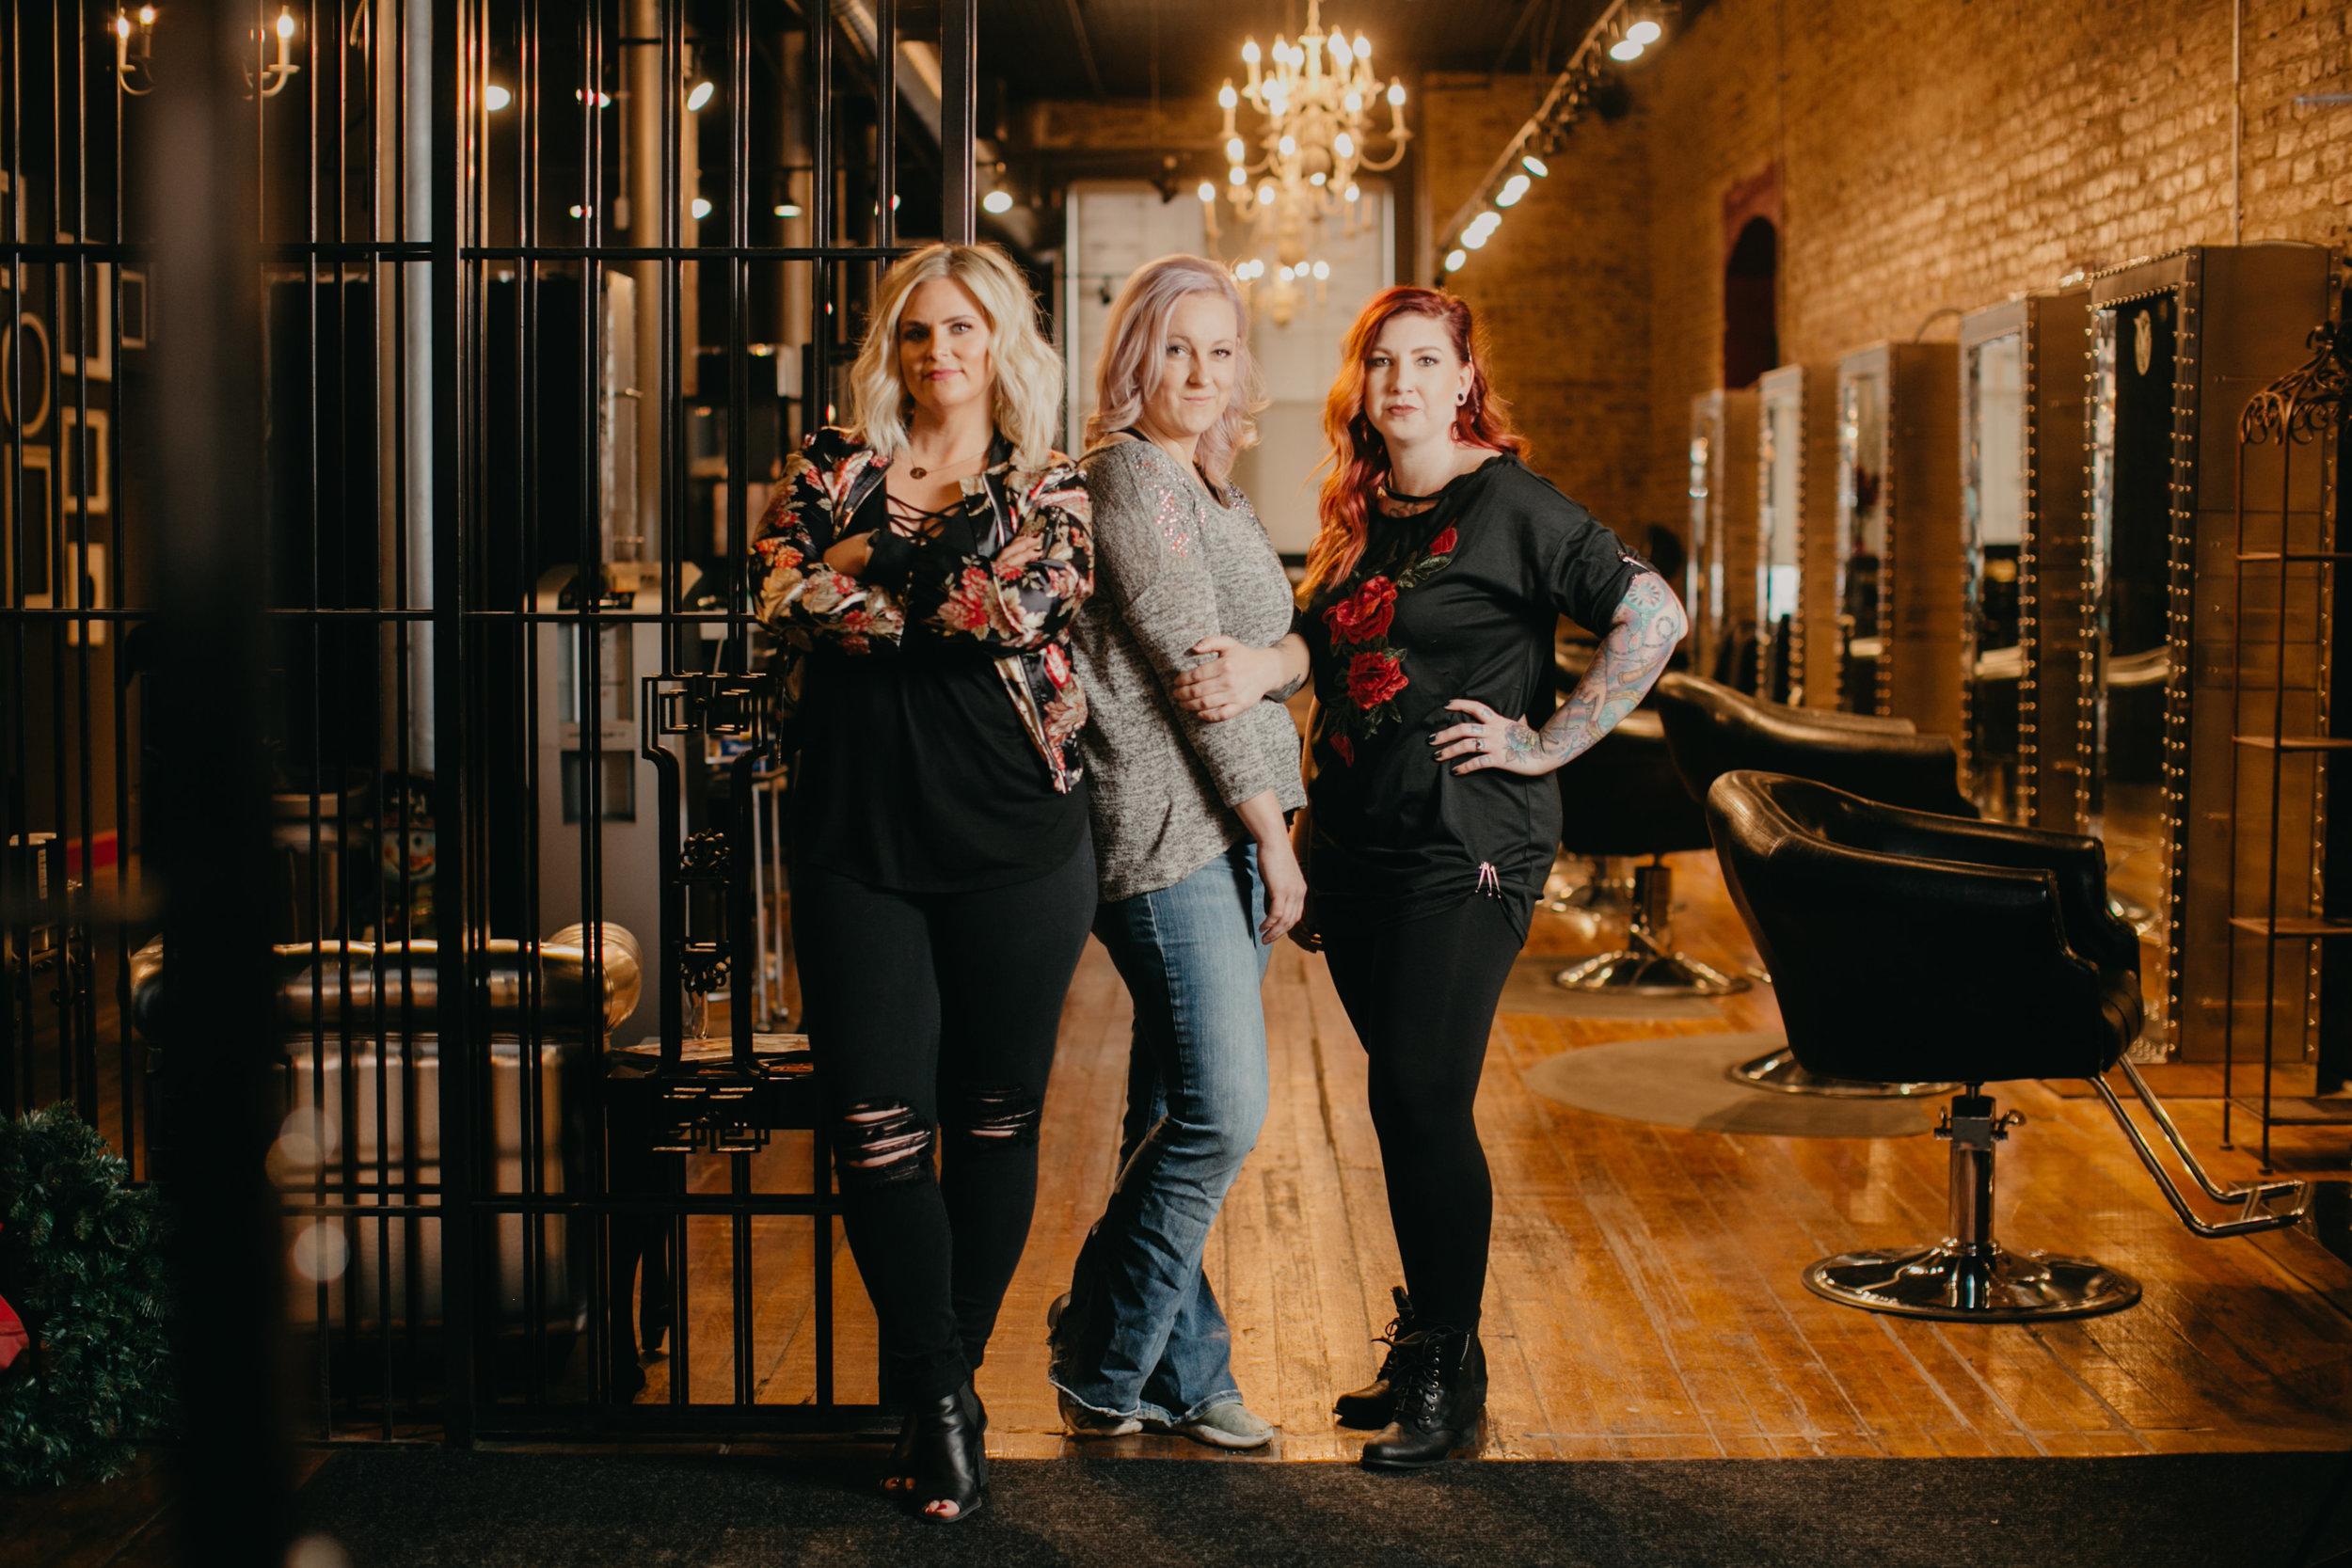 The Talented Team - Kali Rahder, Salon DirectorKelli Lambert, Front Desk ManagerSarah Root, Salon Director